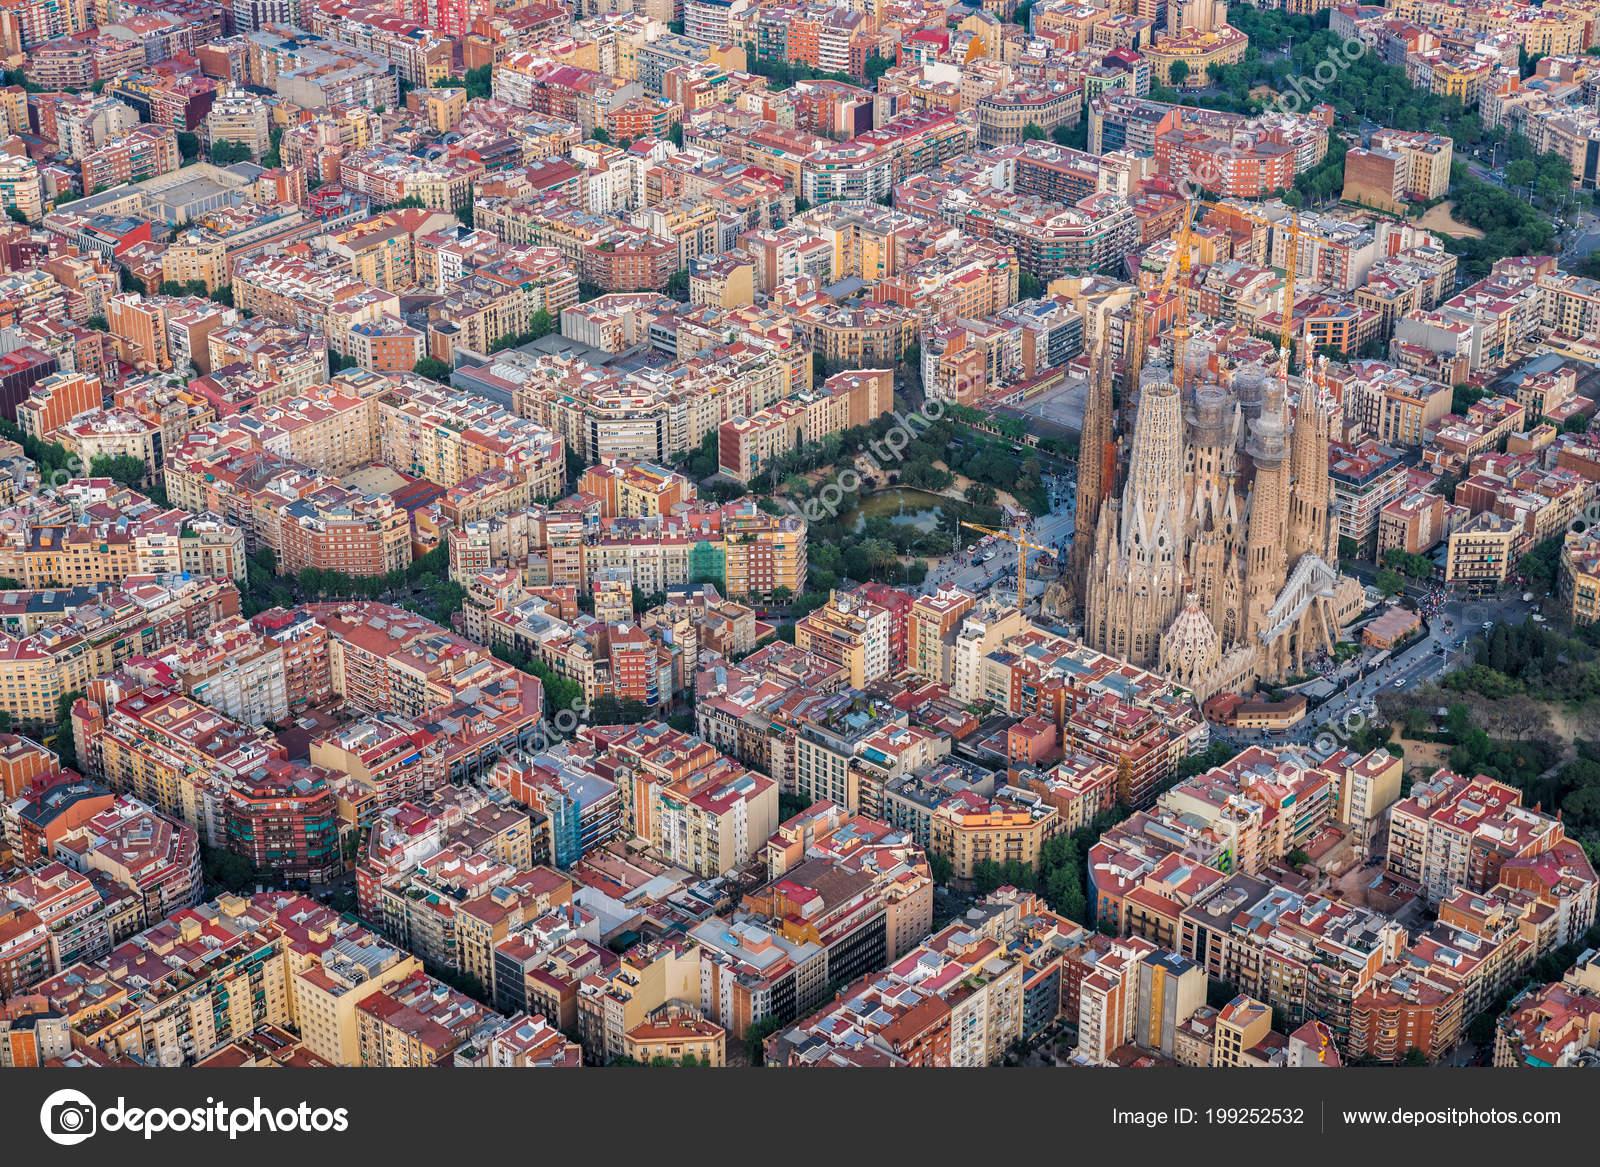 Áˆ Barselona Vid Sverhu Foto Fotografii Barselona Sverhu Skachat Na Depositphotos